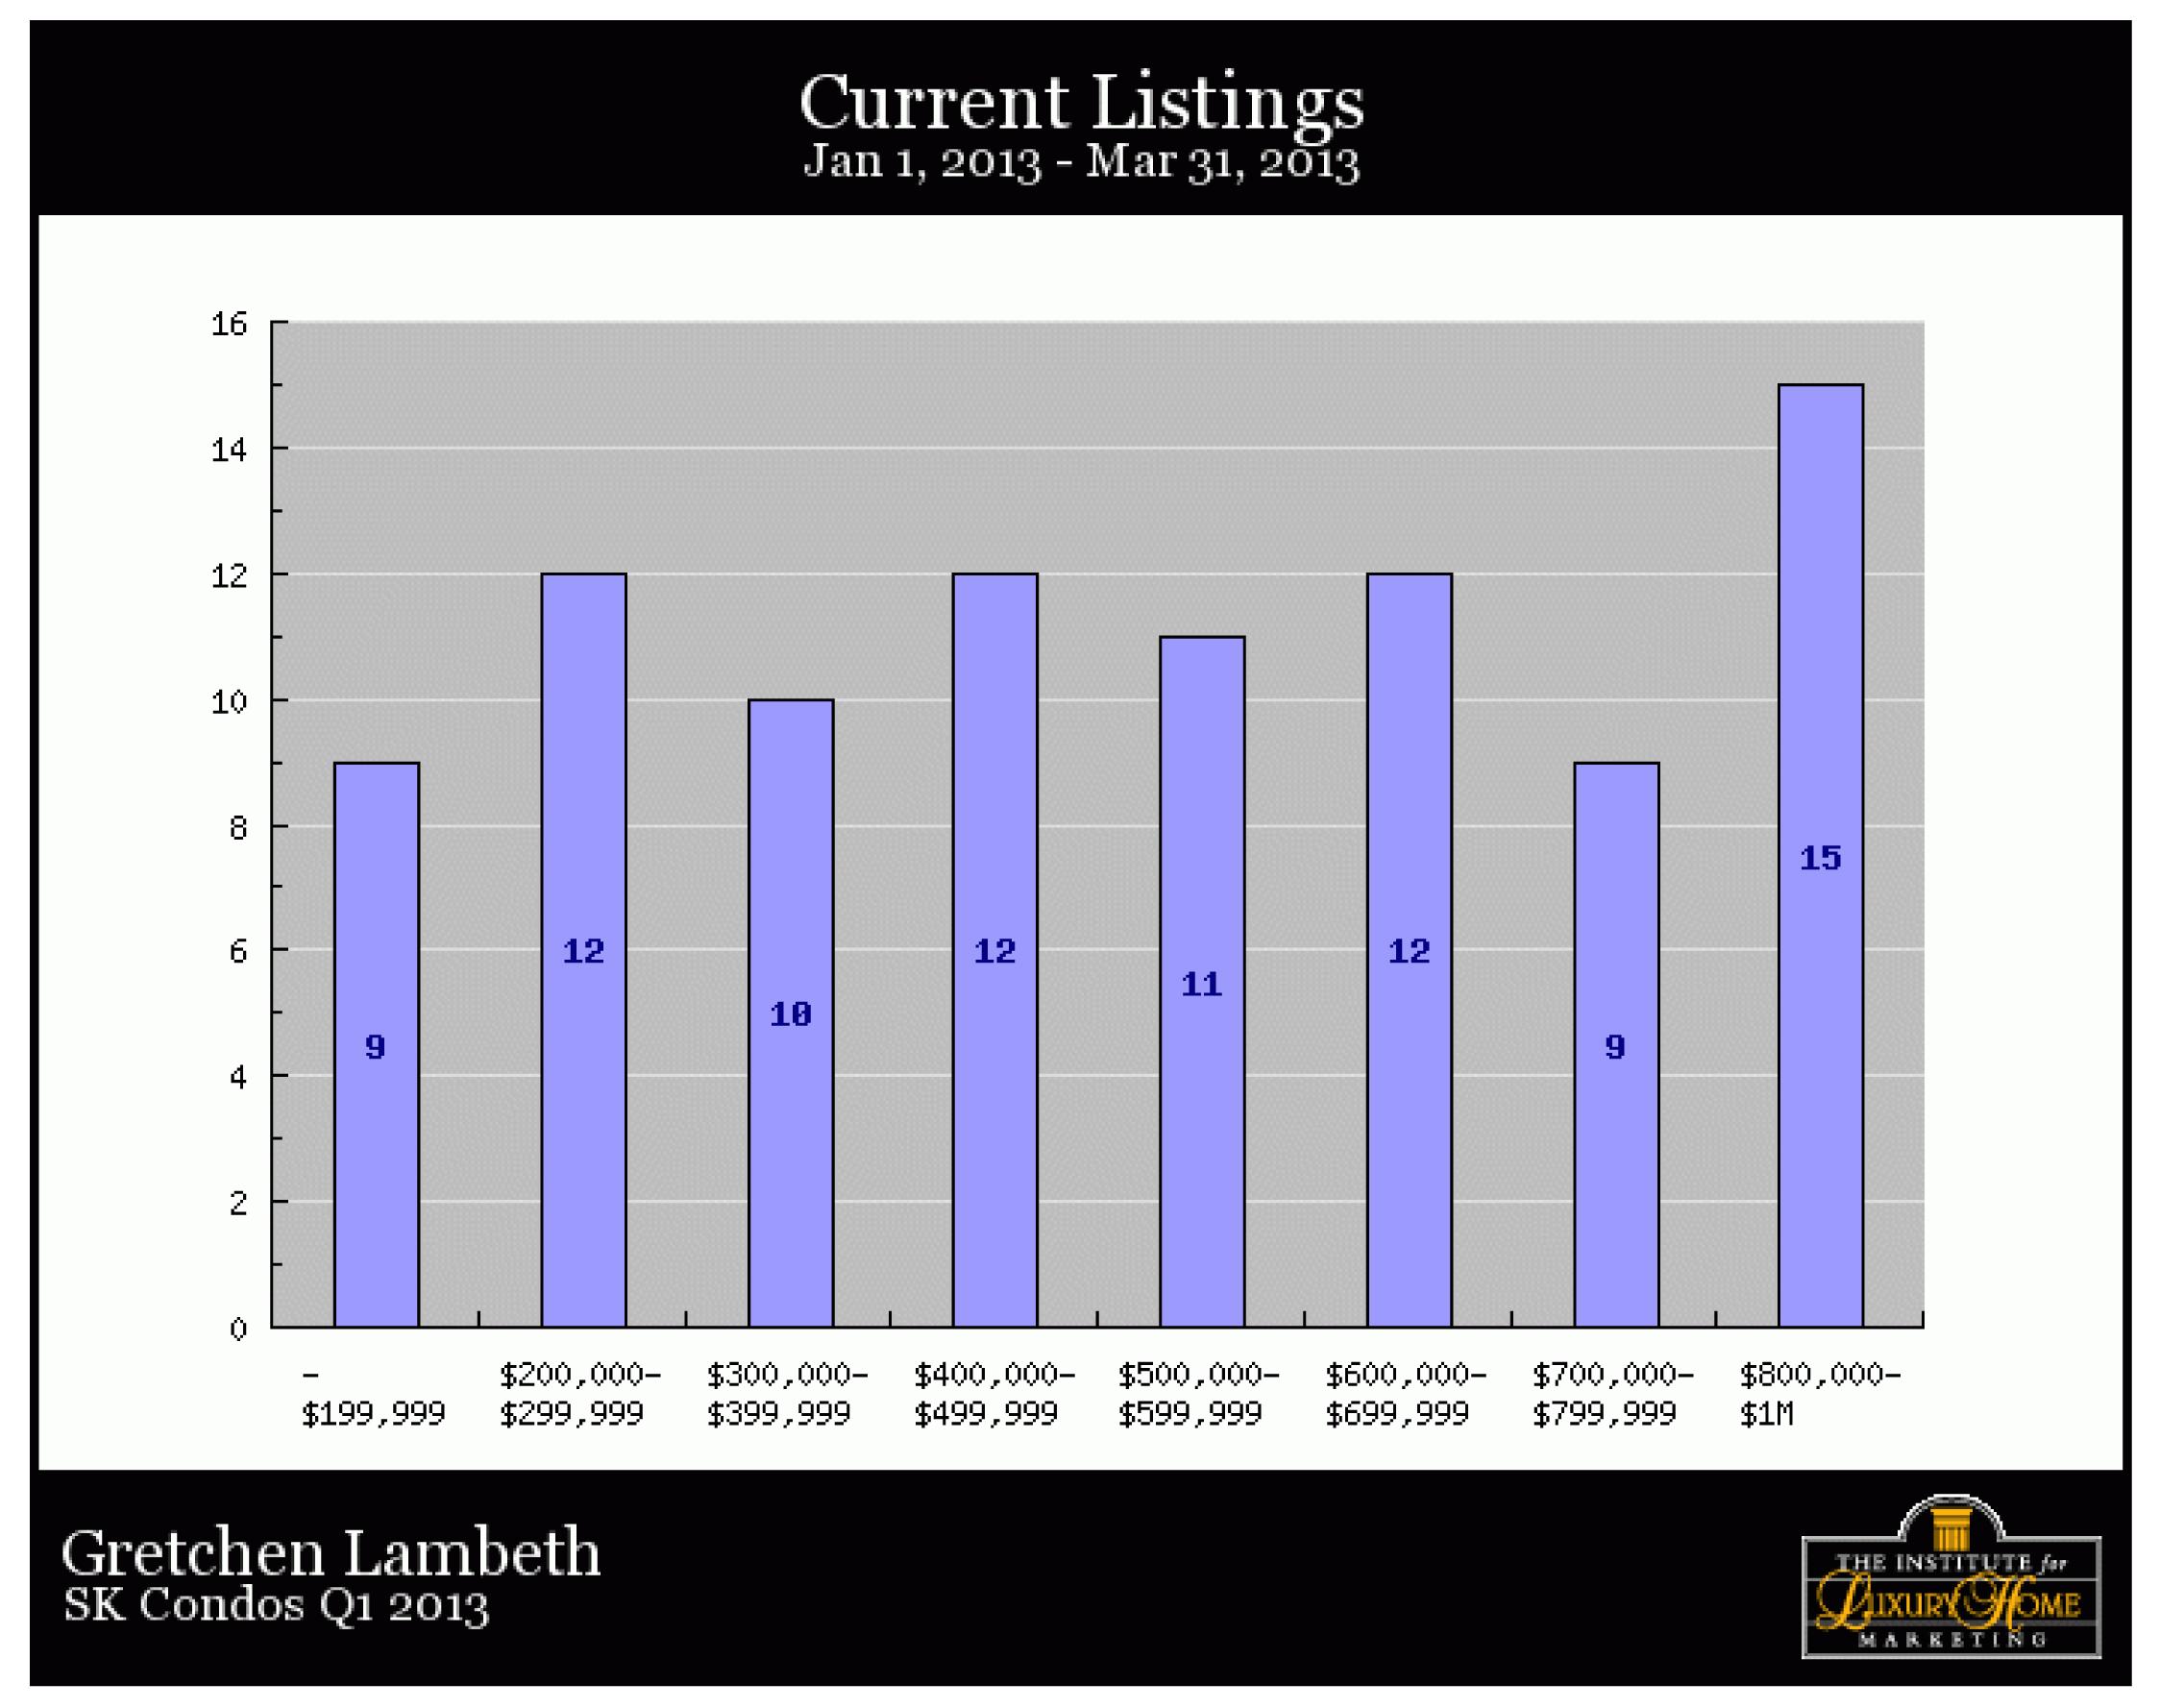 https://www.luxuryhomemarketing.com/portal/Graph_Print.html?ite